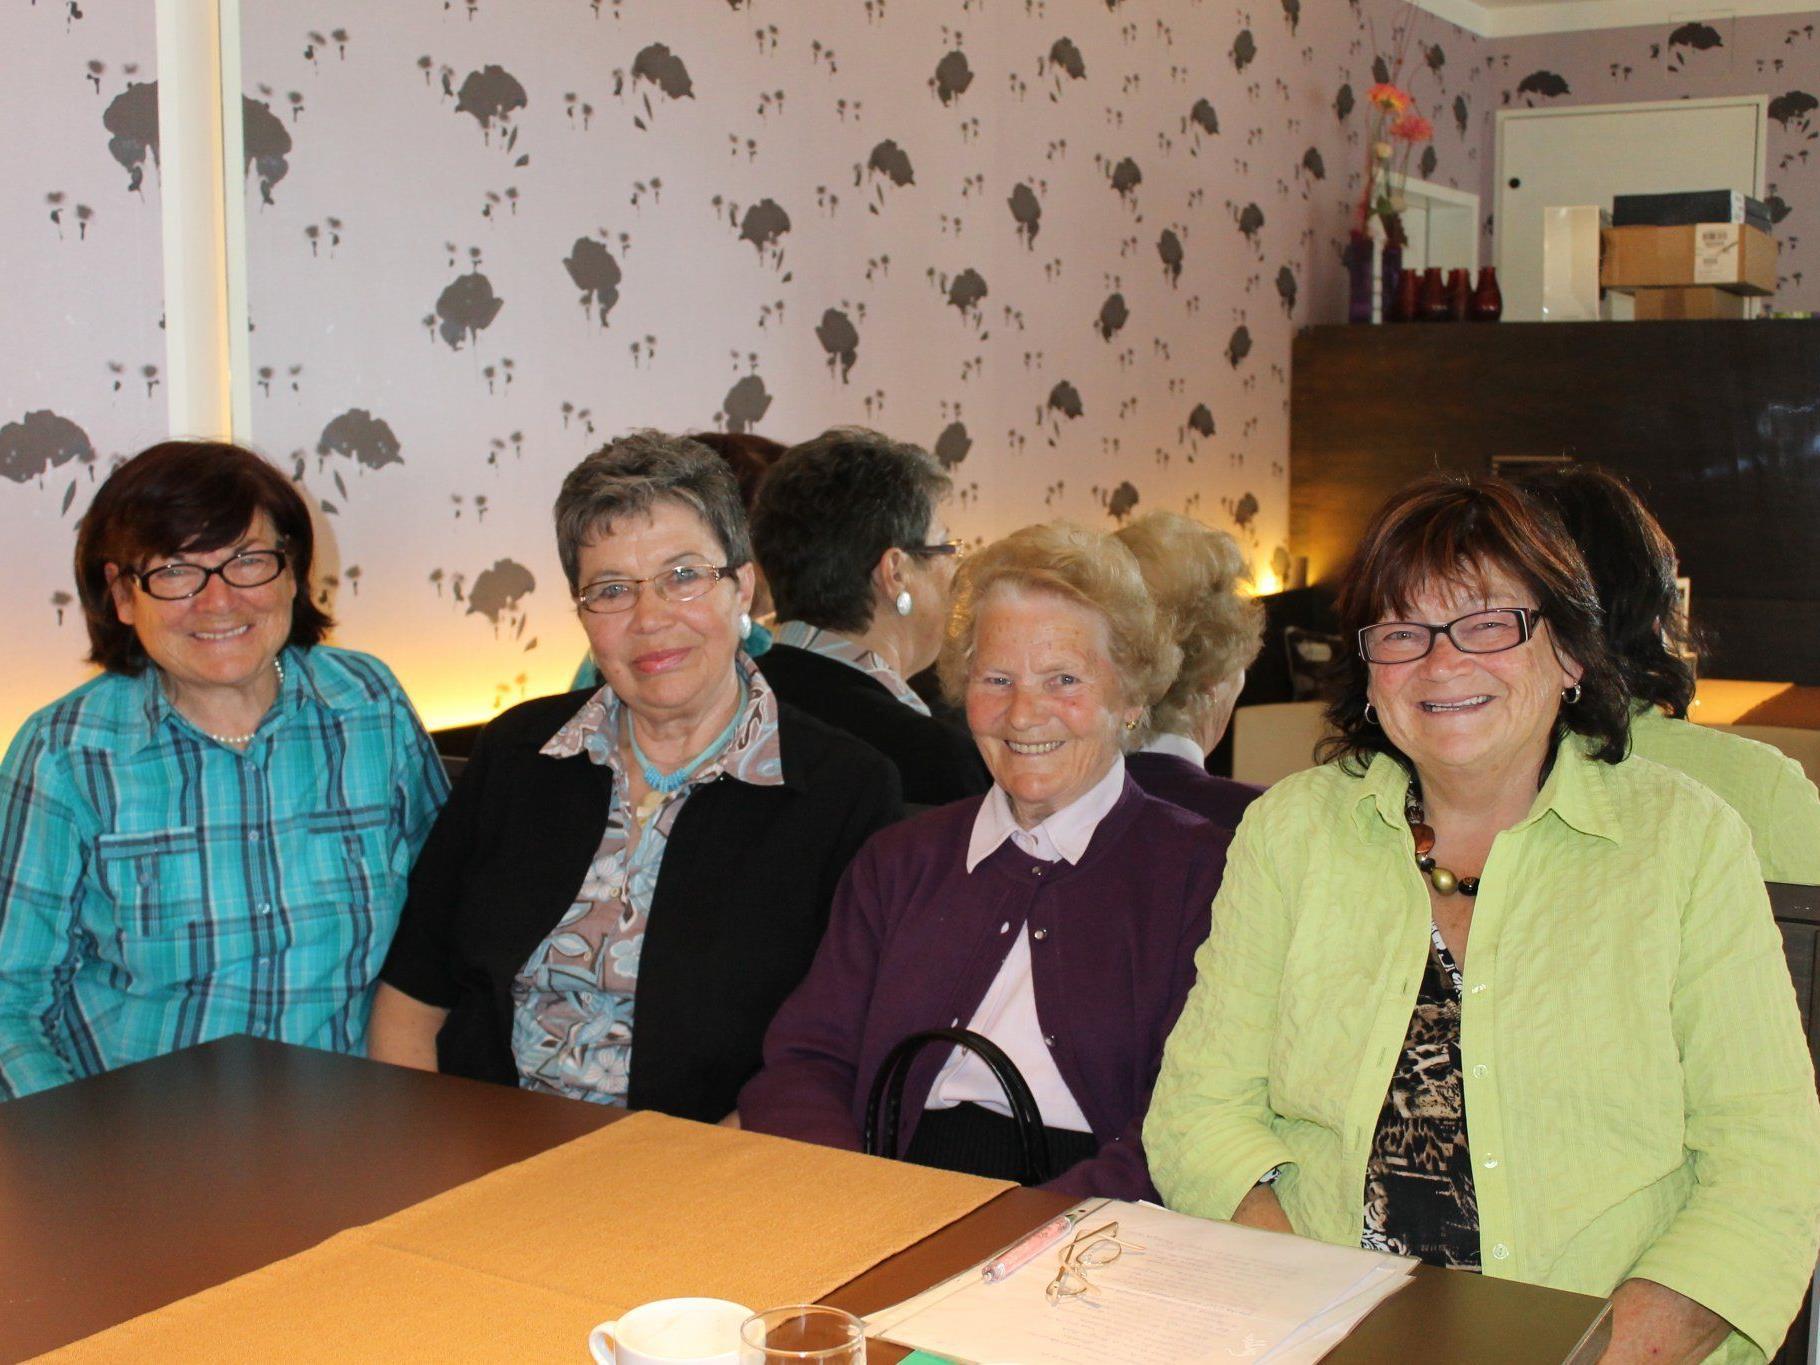 v.li.Anneliese Zerlauth, Lidwina Boso, Hermine Bischof u. Irene Würbel-Walter